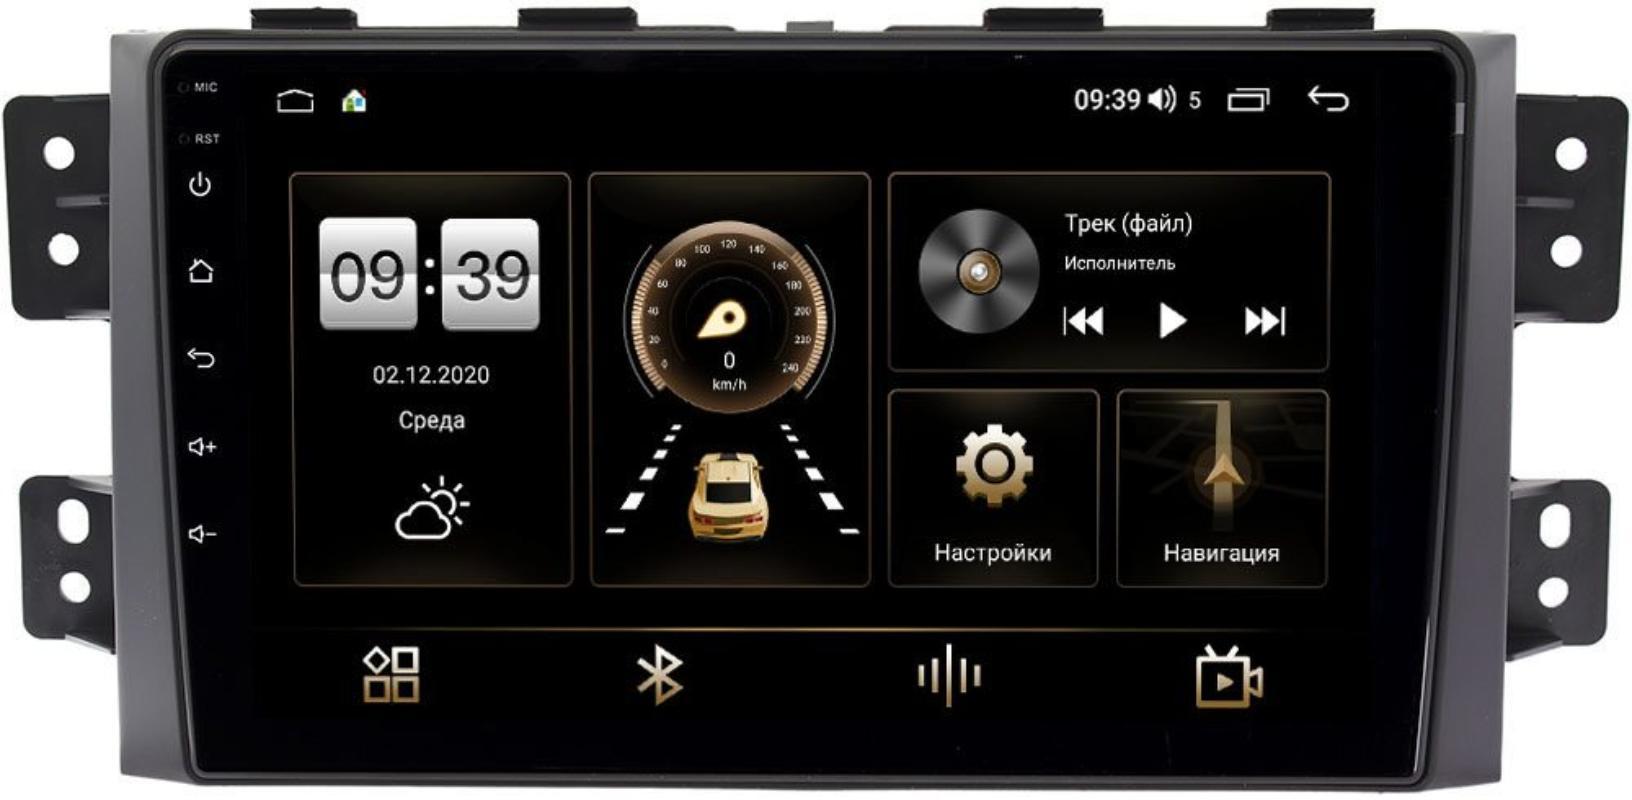 Штатная магнитола Kia Mohave I 2008-2018 LeTrun 3792-9142 на Android 10 (4/64, DSP, QLed) С оптическим выходом (+ Камера заднего вида в подарок!)